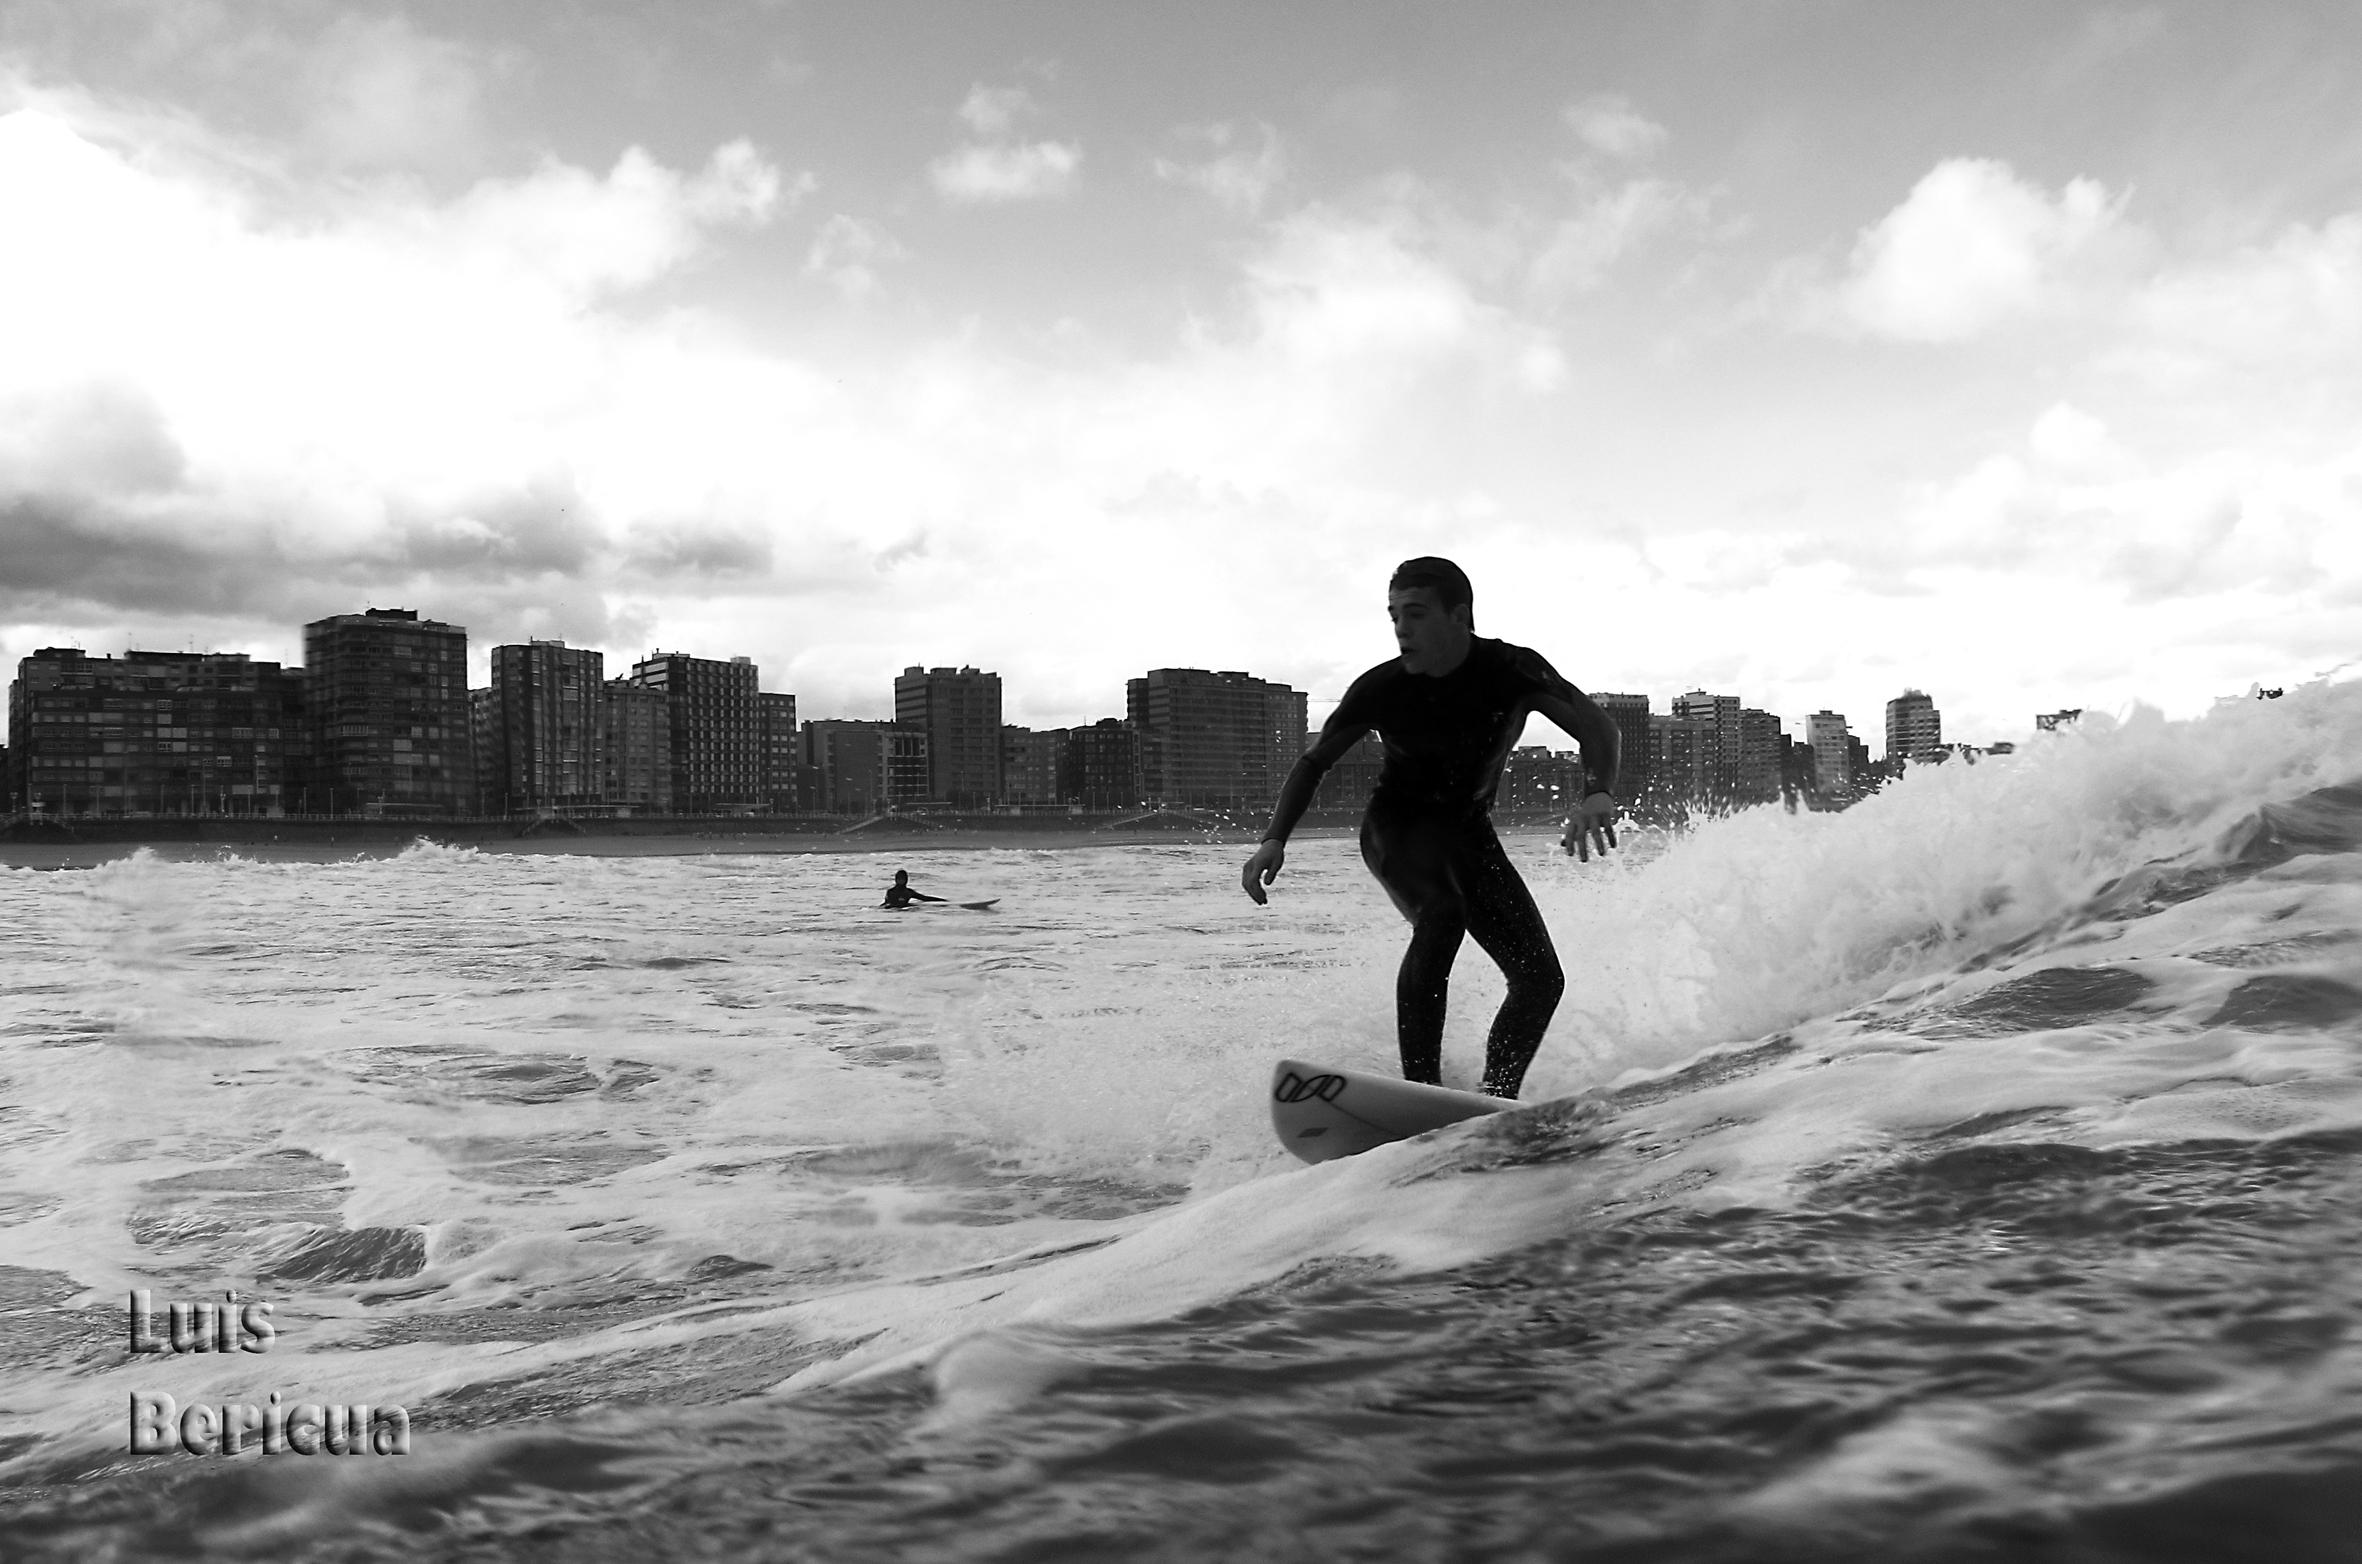 Alex surf en Gijón, San Lorenzo. Luis Bericua.